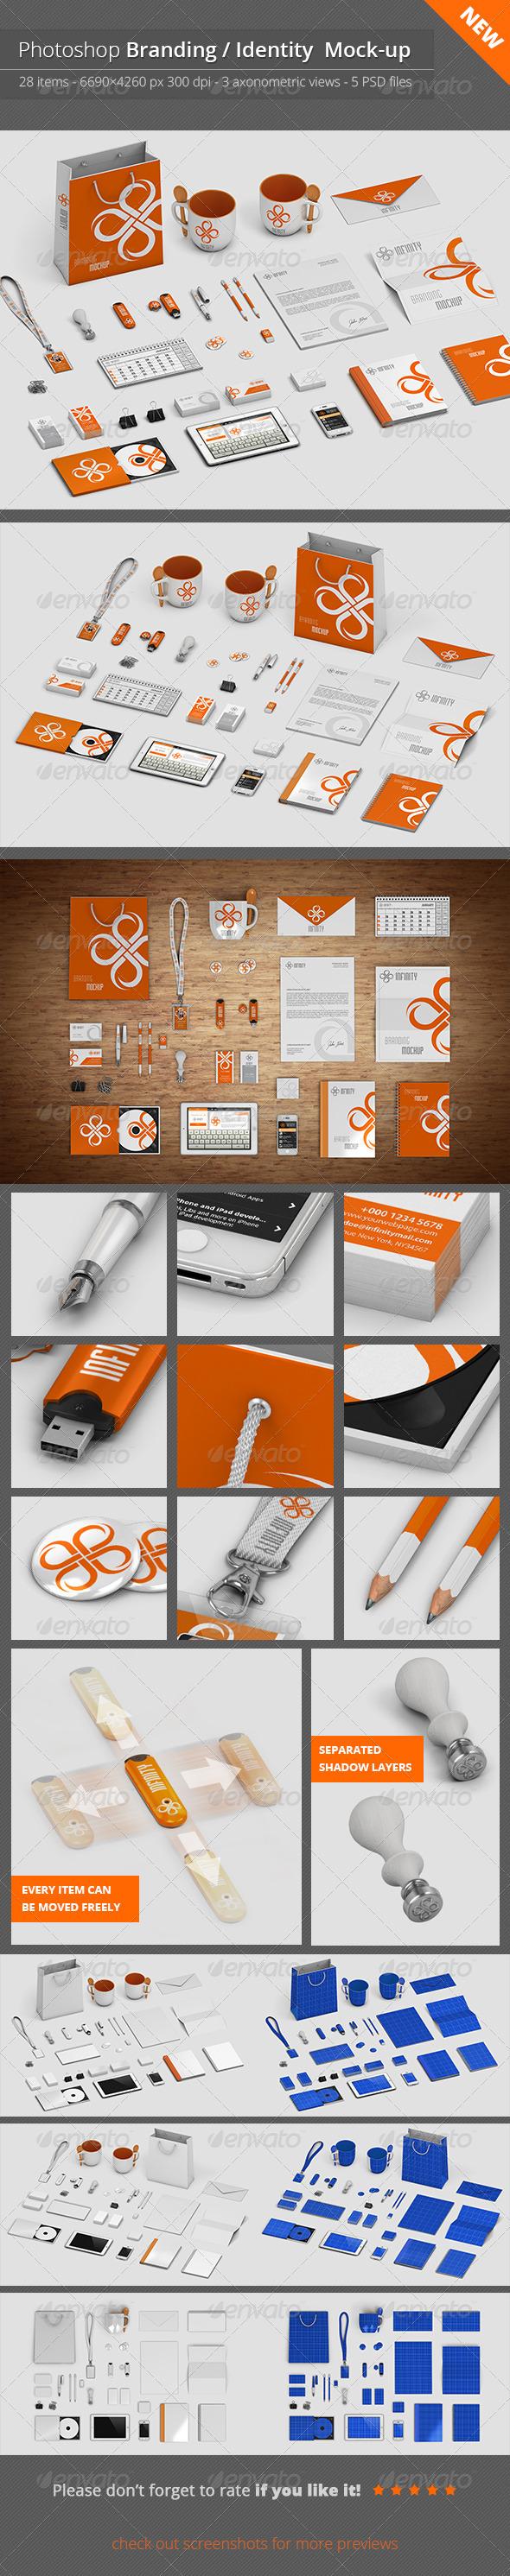 Stationery Branding Mock-Up V.1